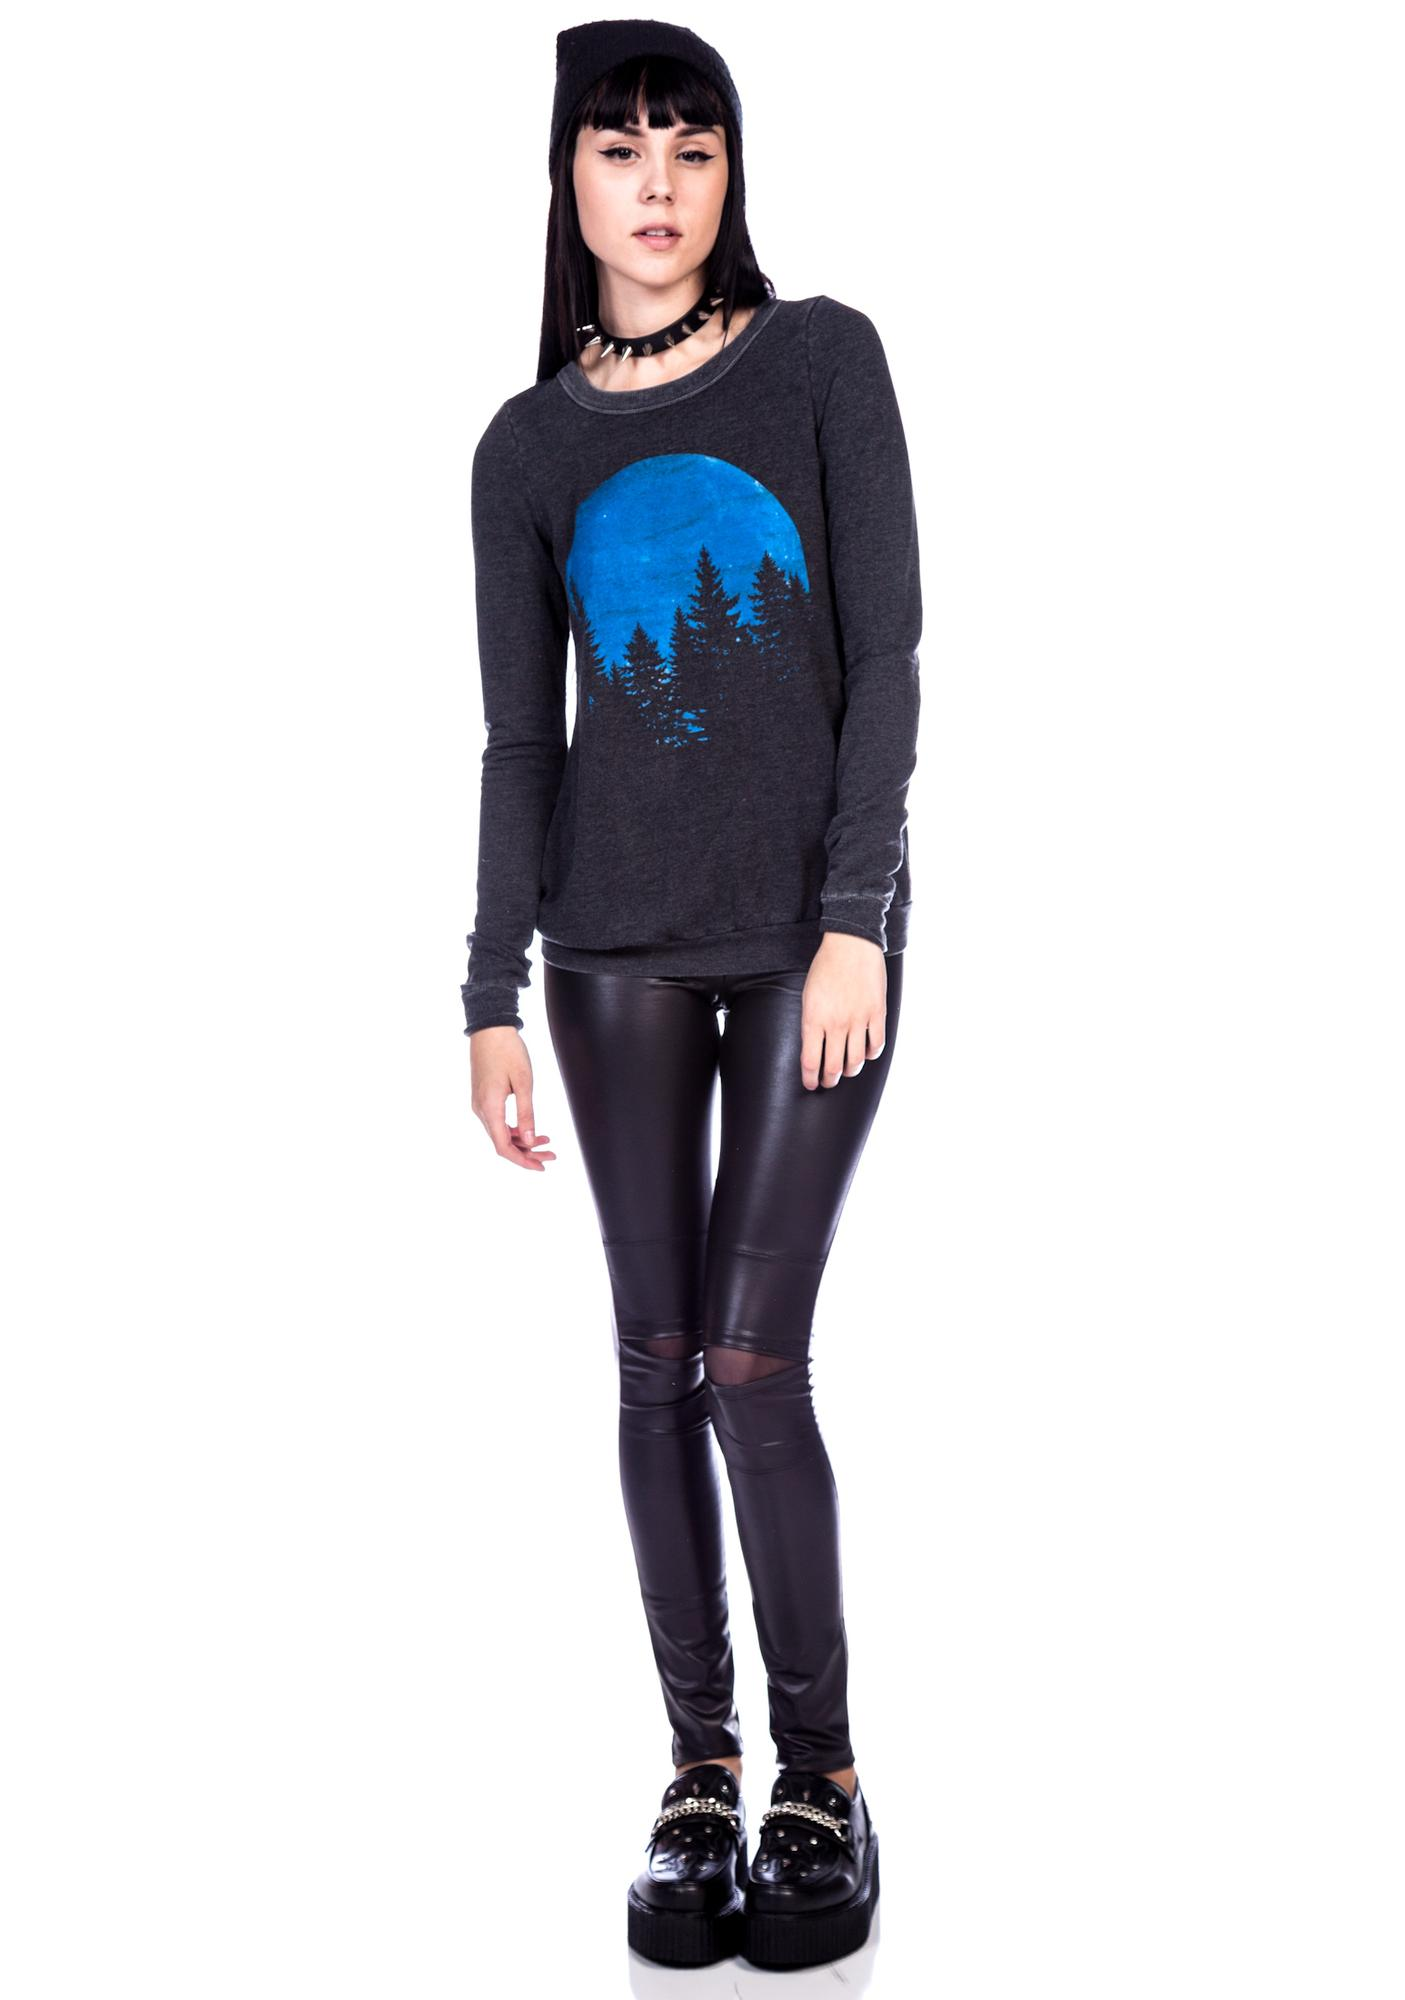 Chaser Blue Moon Cross Back Pullover Sweatshirt